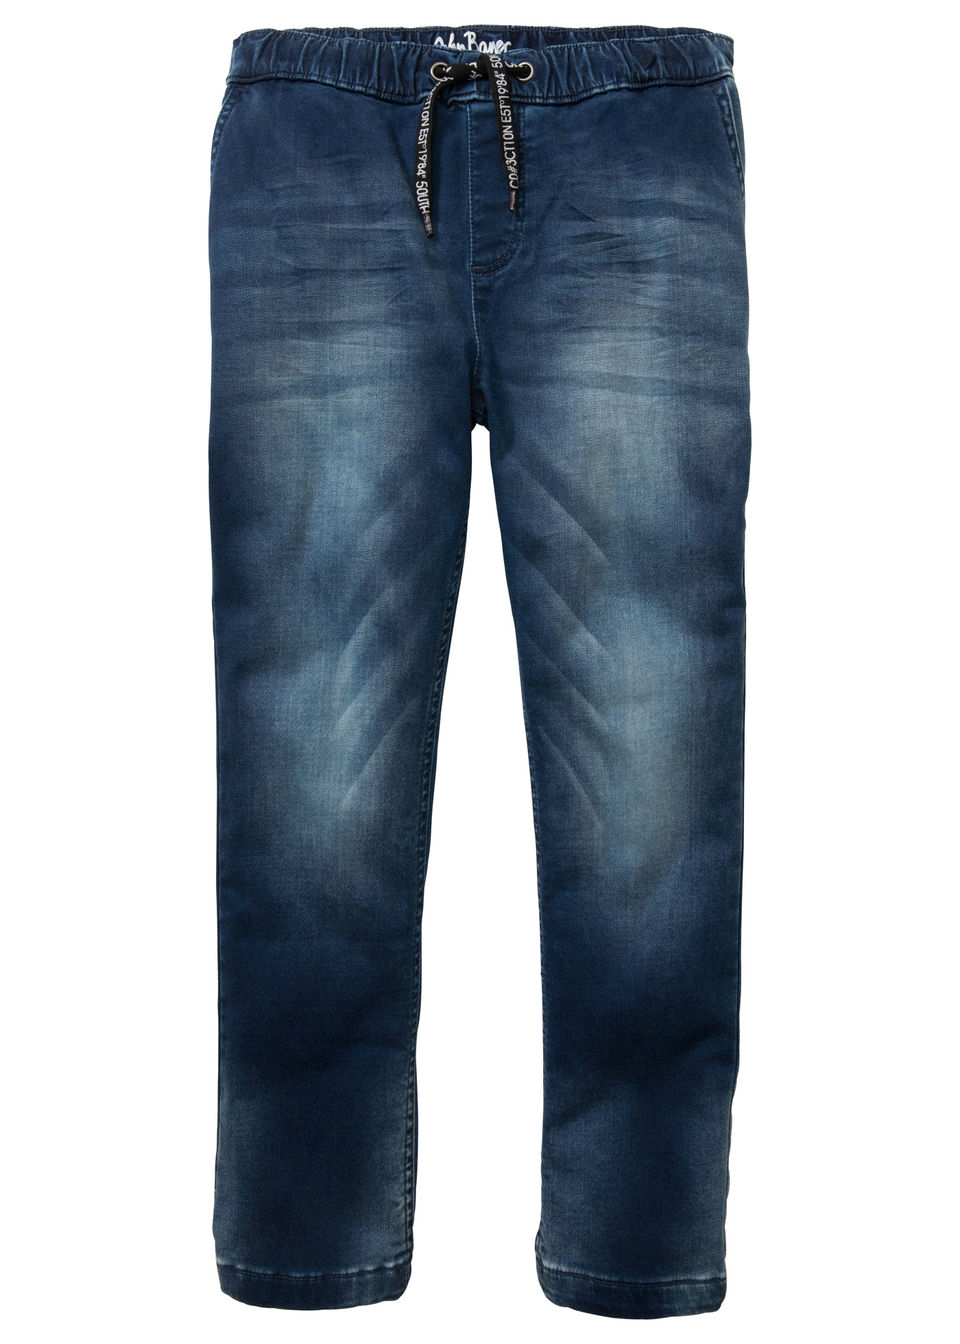 Jeans model sweat bonprix